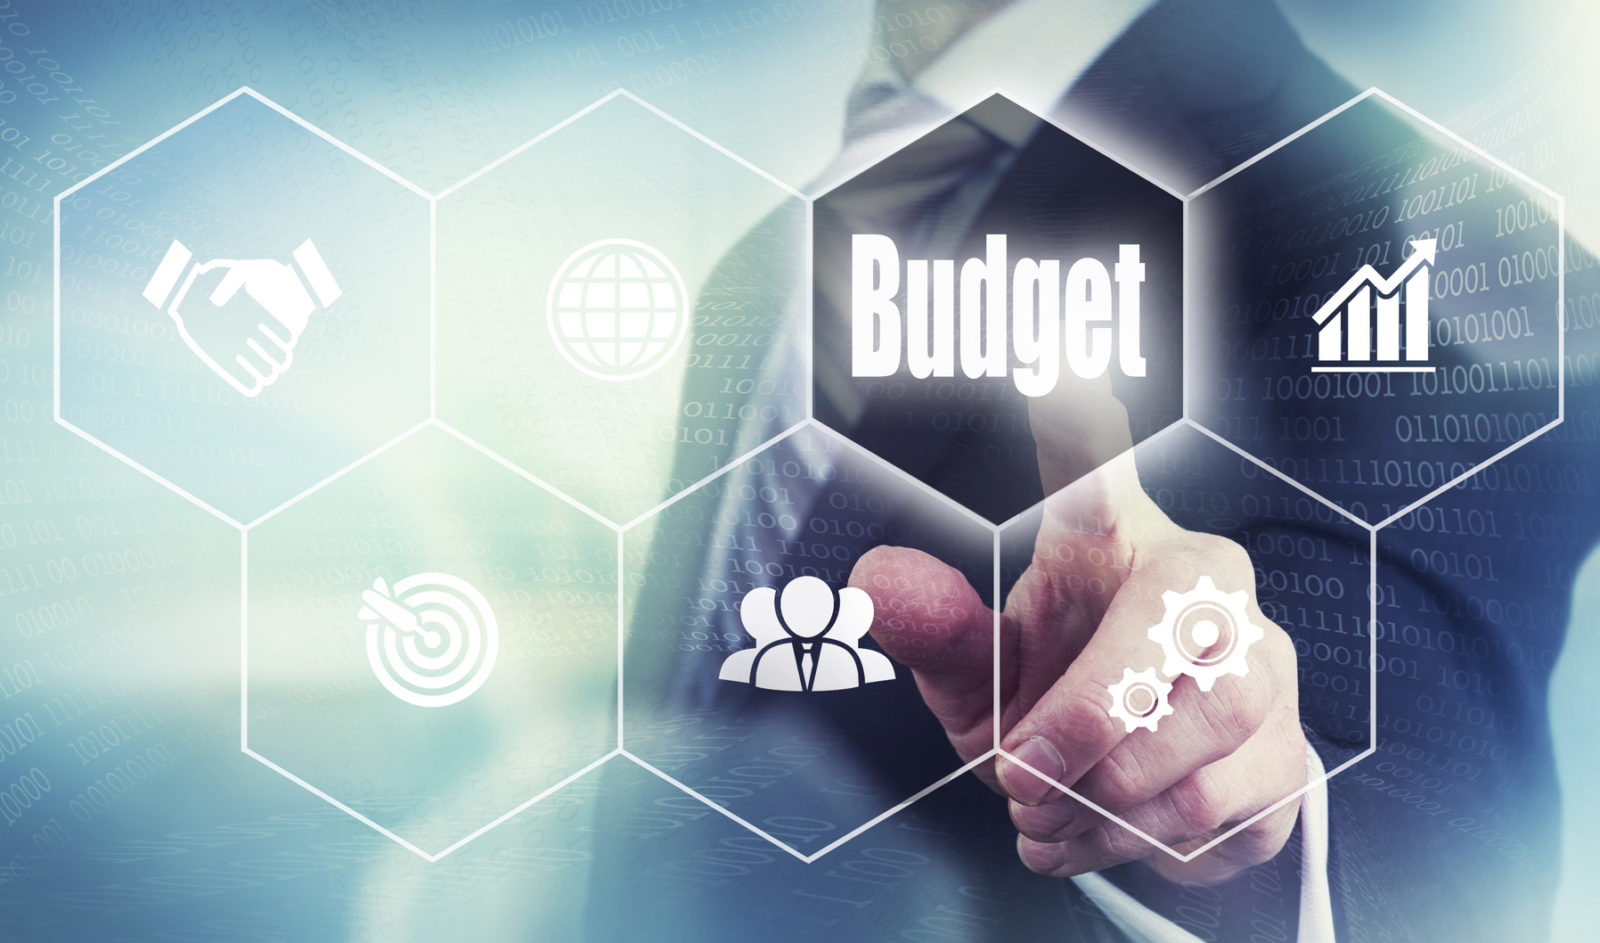 Security Budget